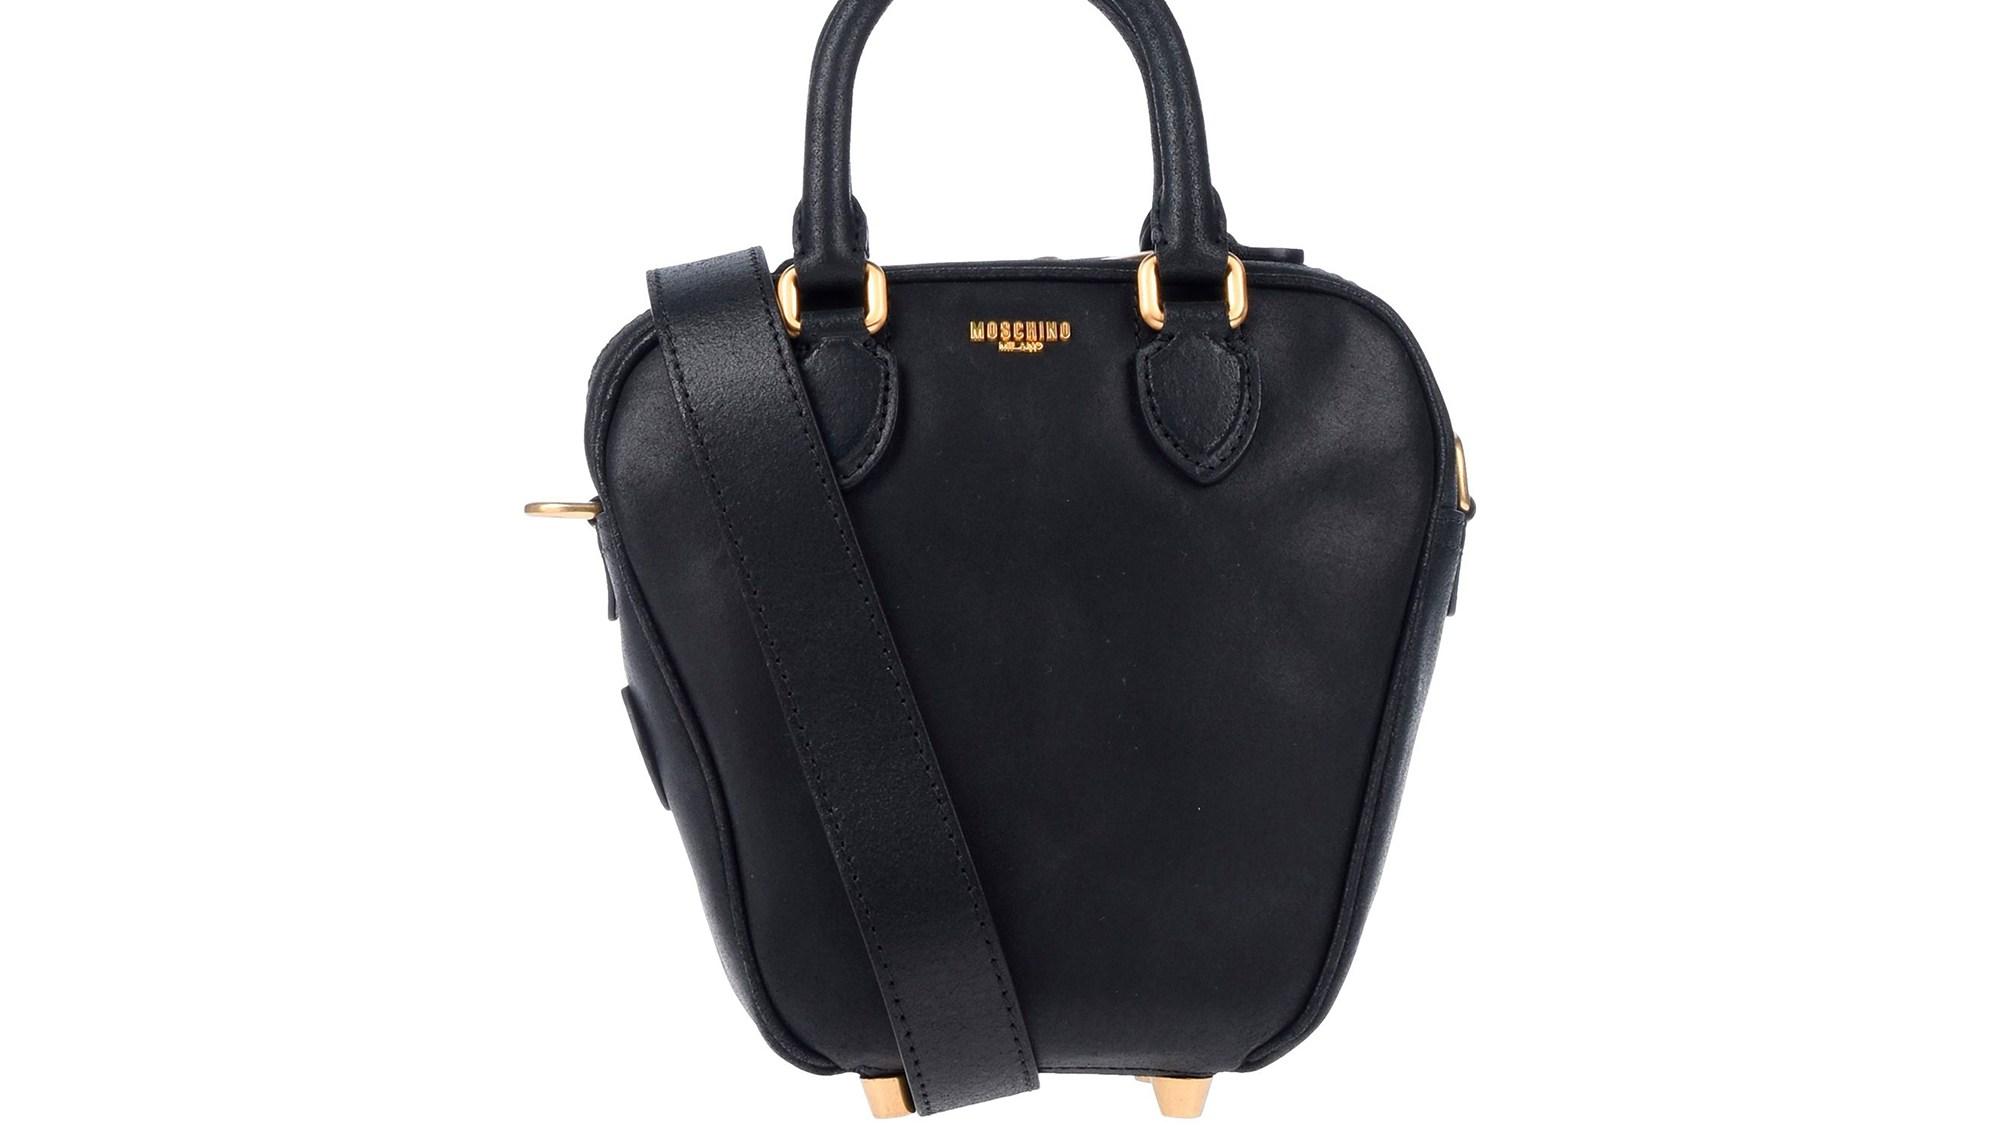 Moschino Bag Black